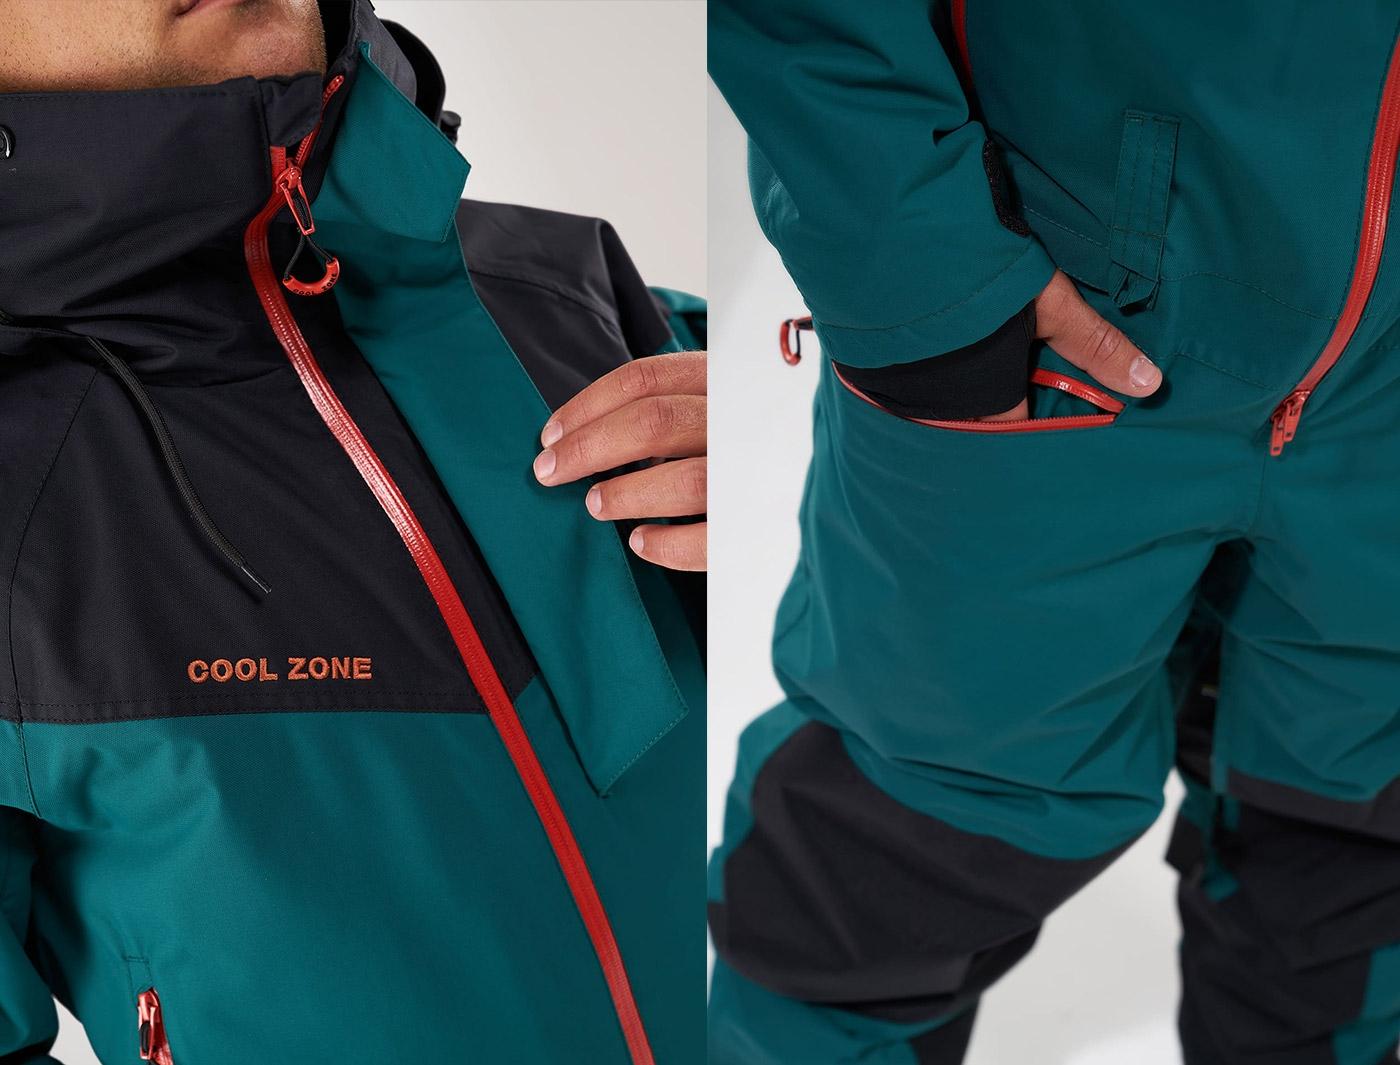 Комбинезон Cool Zone IRON KN2104/20/28 Черный/Болотный (2020)